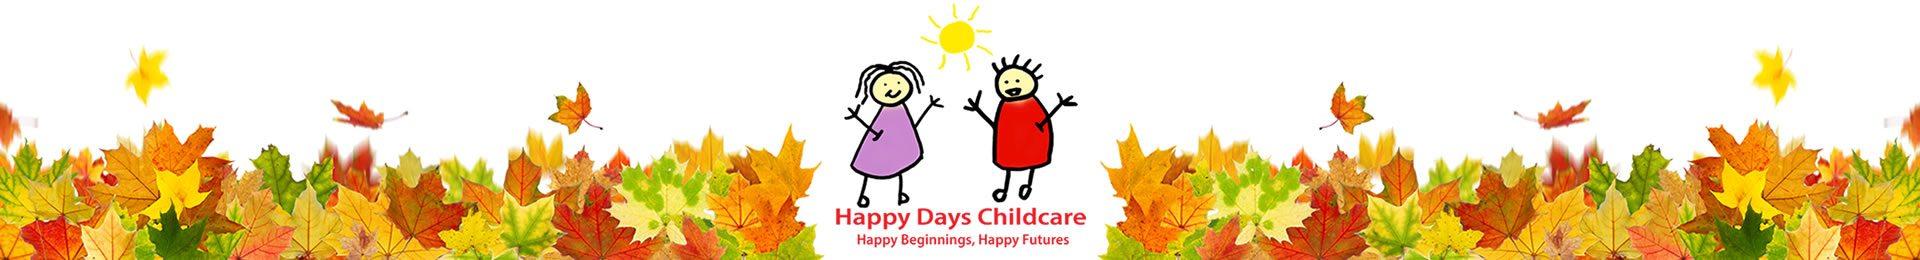 Happy Days Childcare Nursery Woodland Wanderers